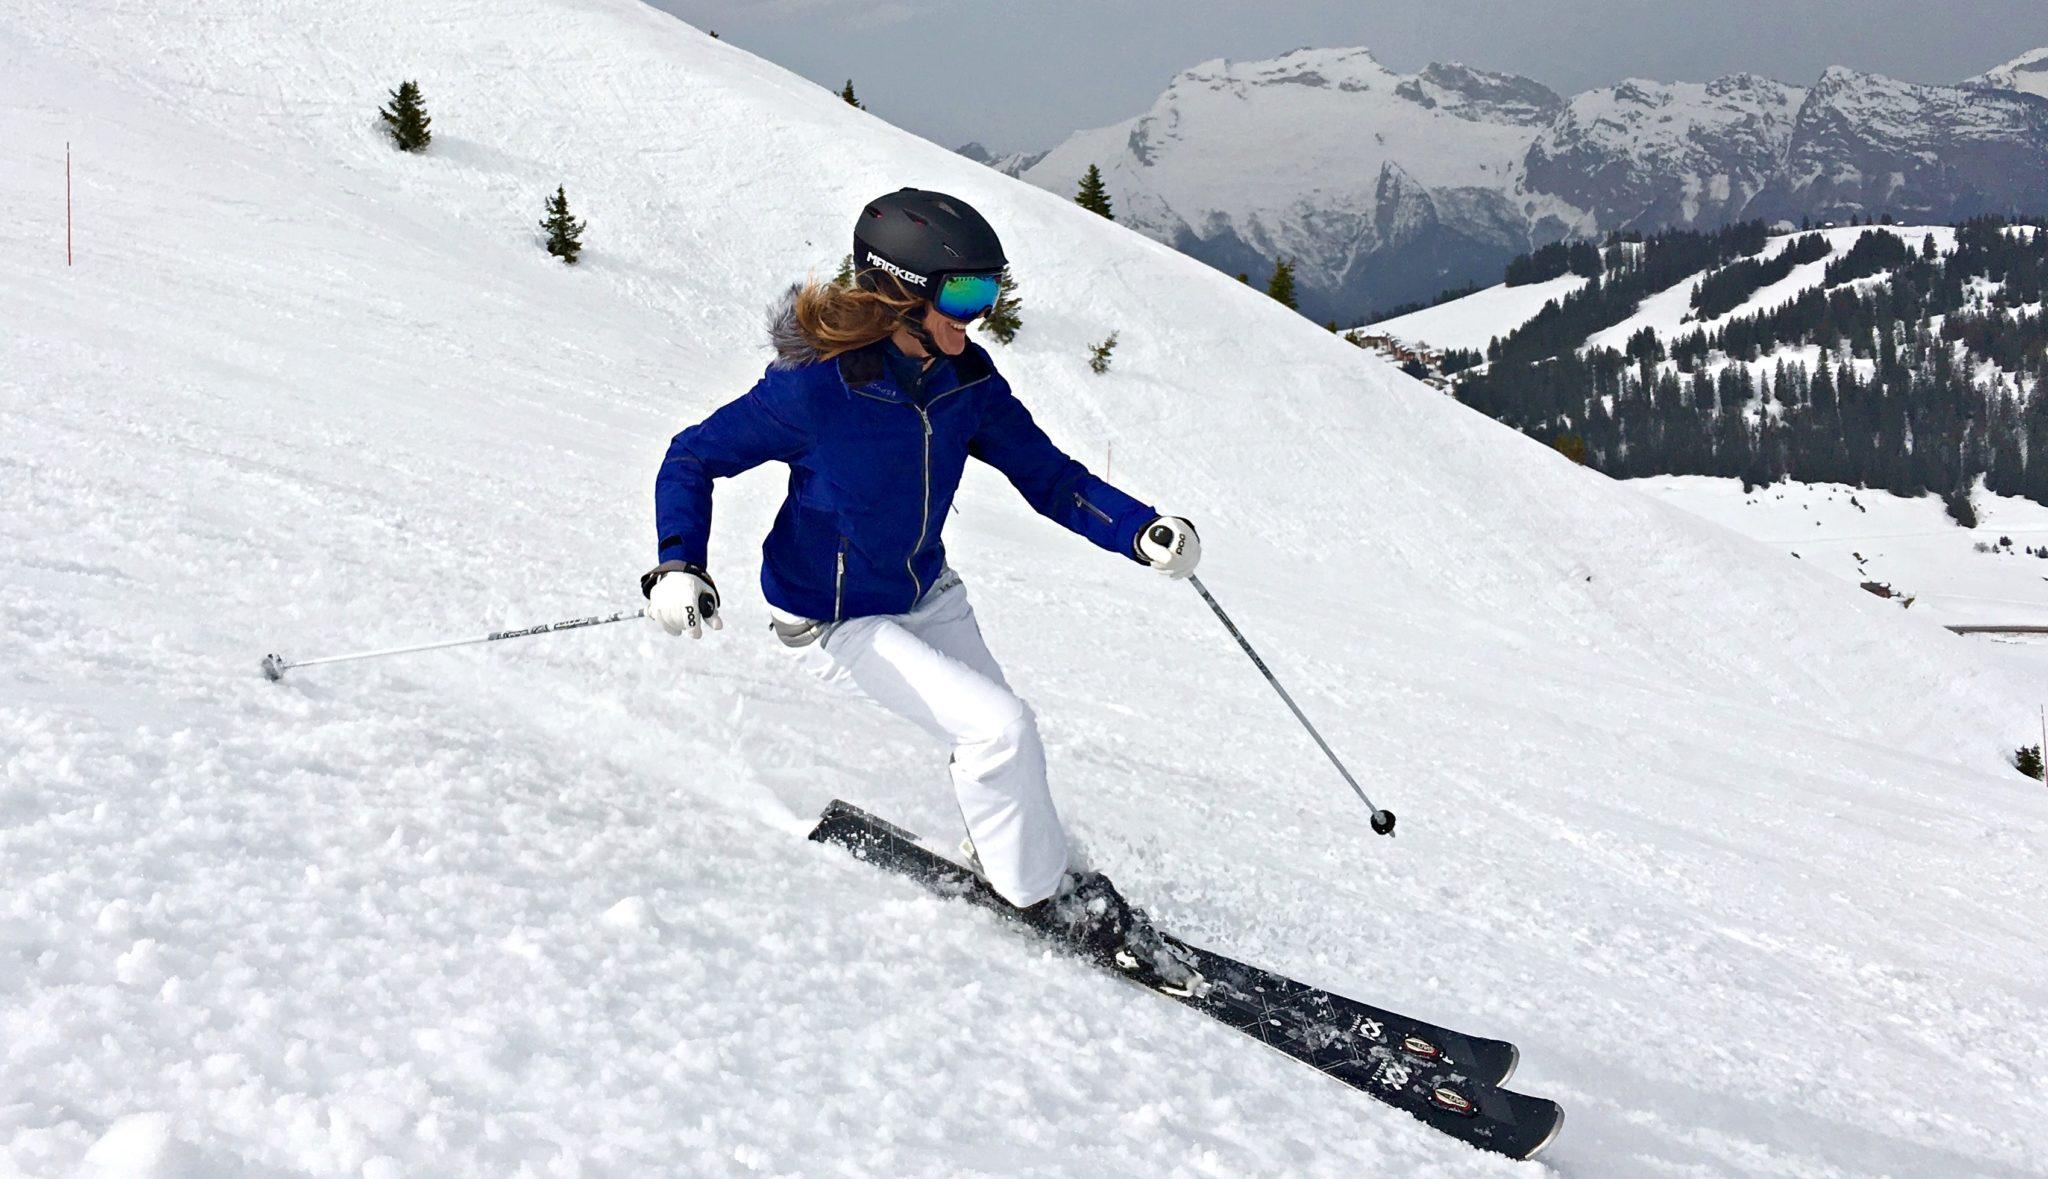 Ski alpin | snowflike